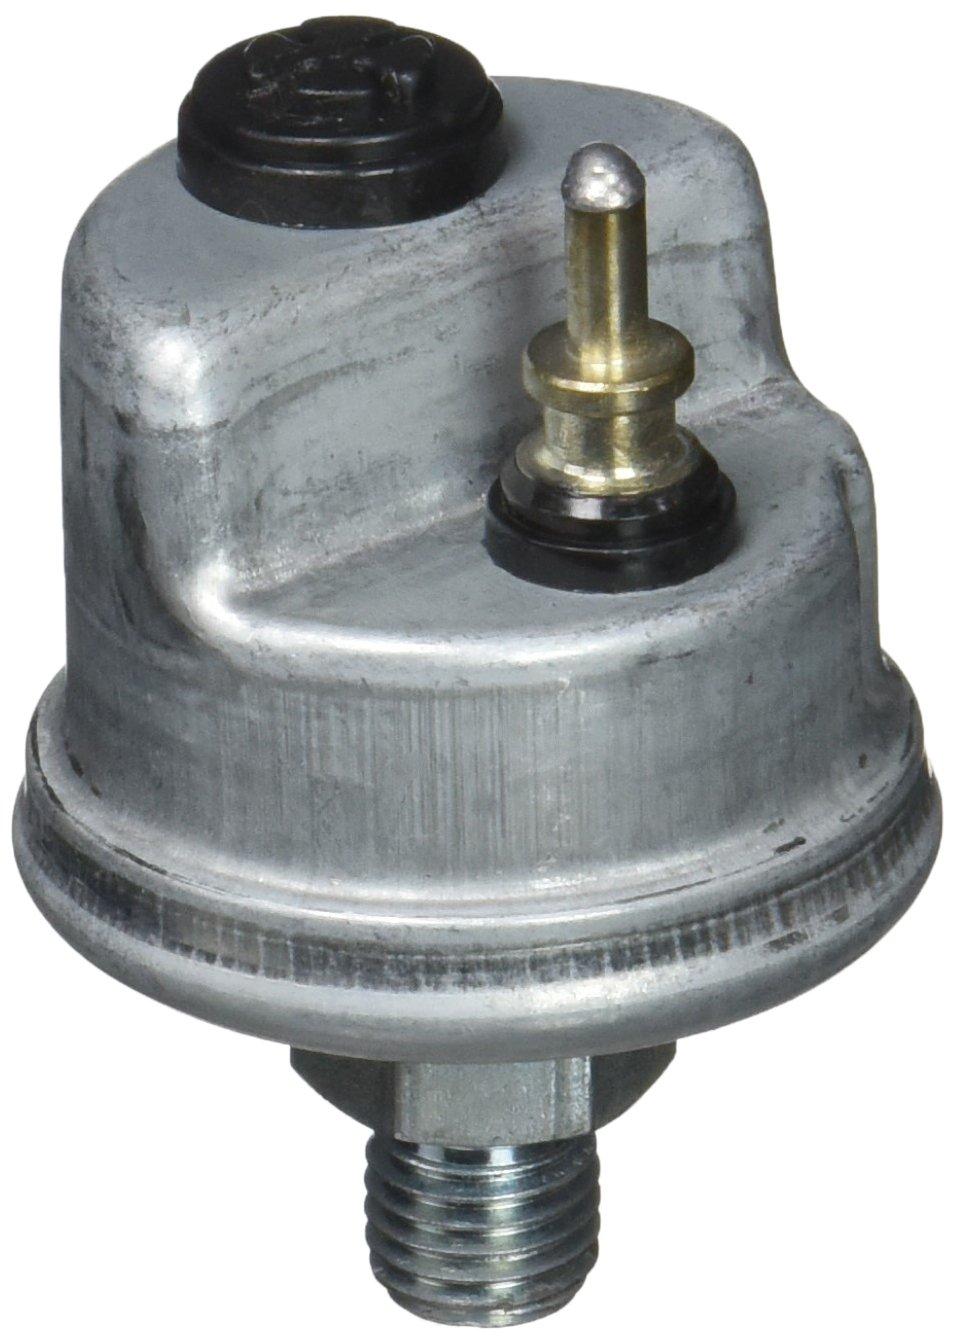 MTC 3524/006-542-94-17 Oil Pressure Sender (Mercedes models) 3524 / 006-542-94-17